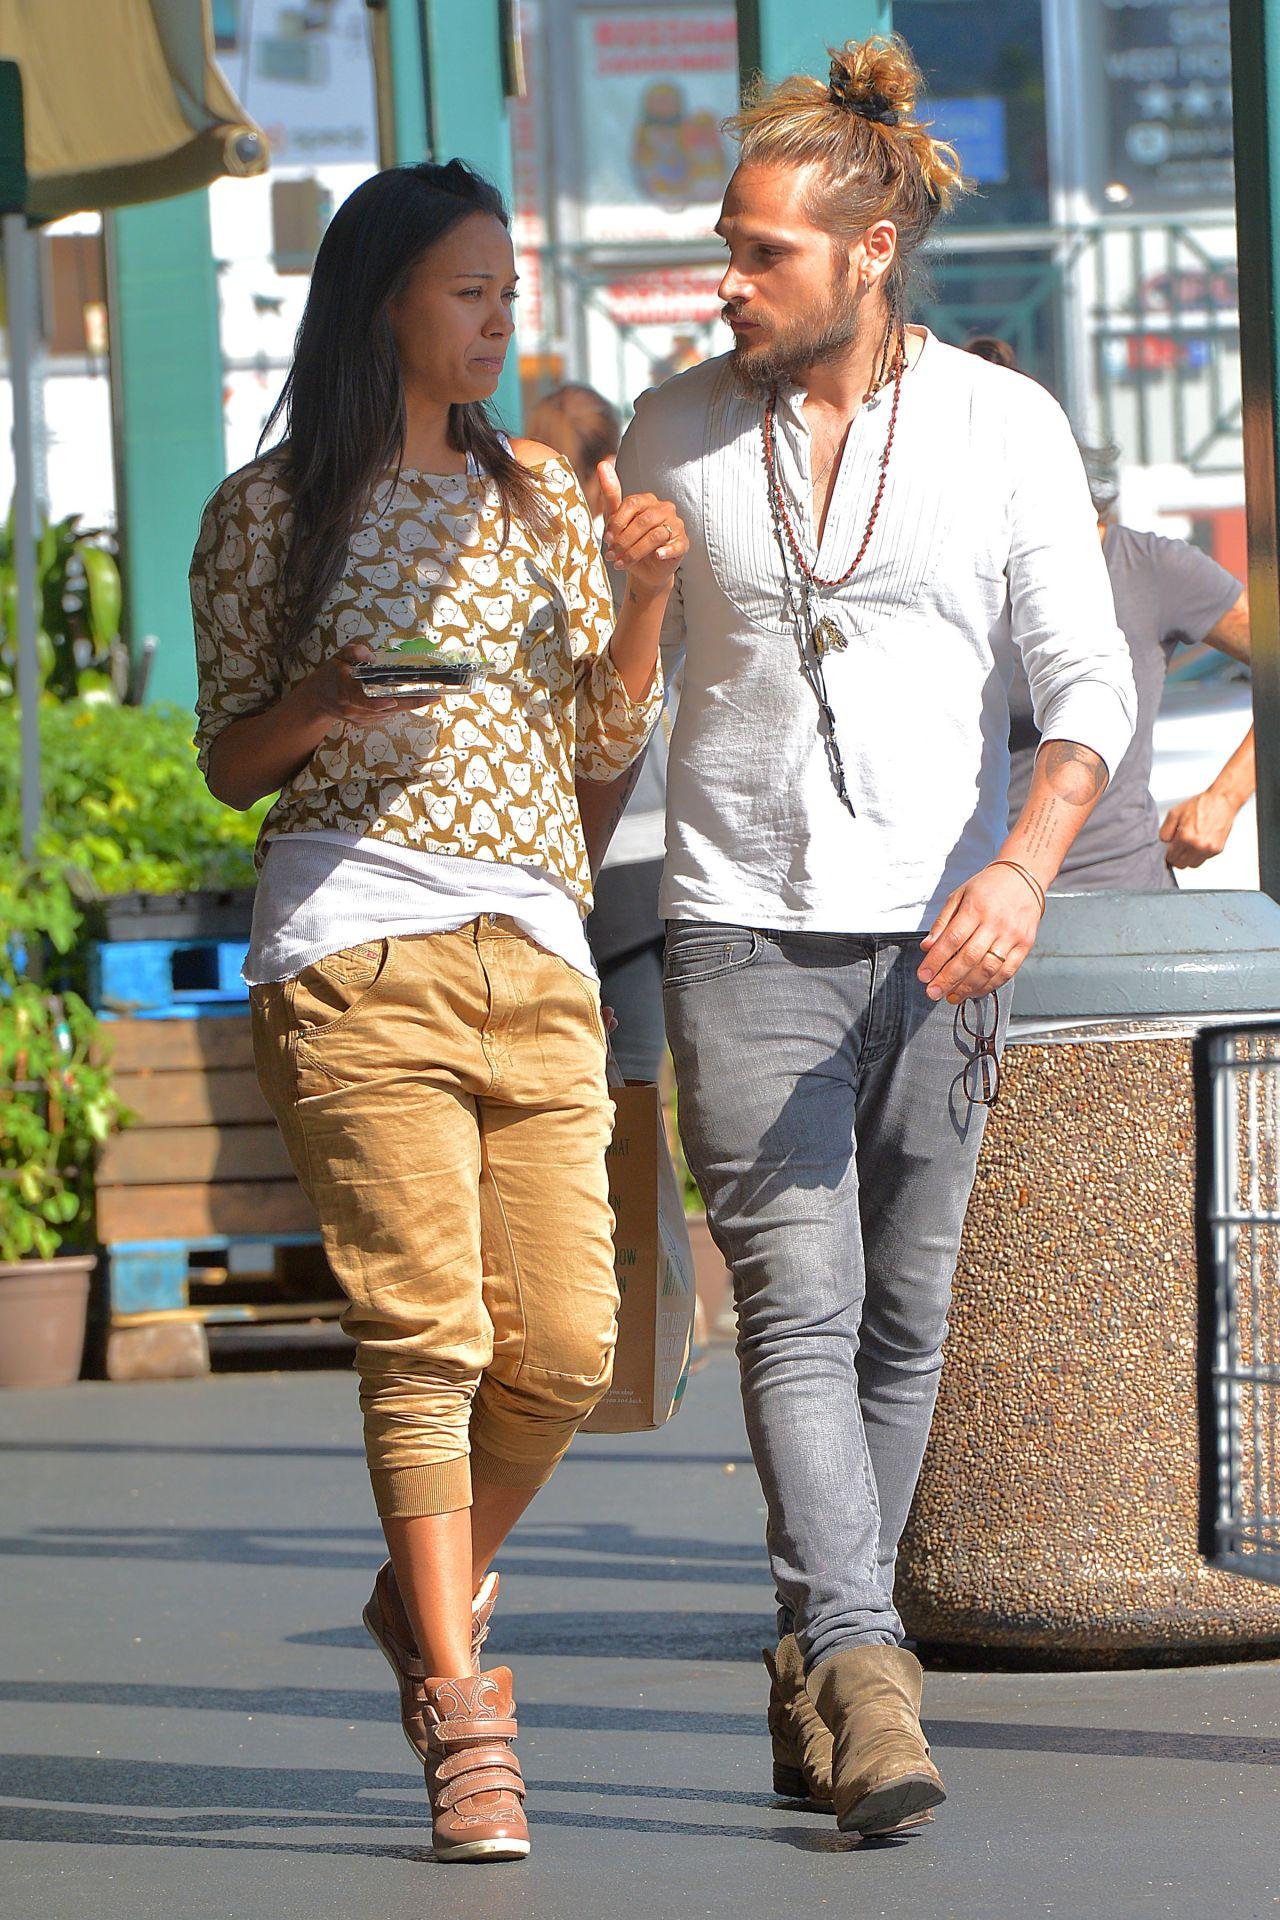 Zoe Saldana And Marco Perego Leaving Whole Foods In Los